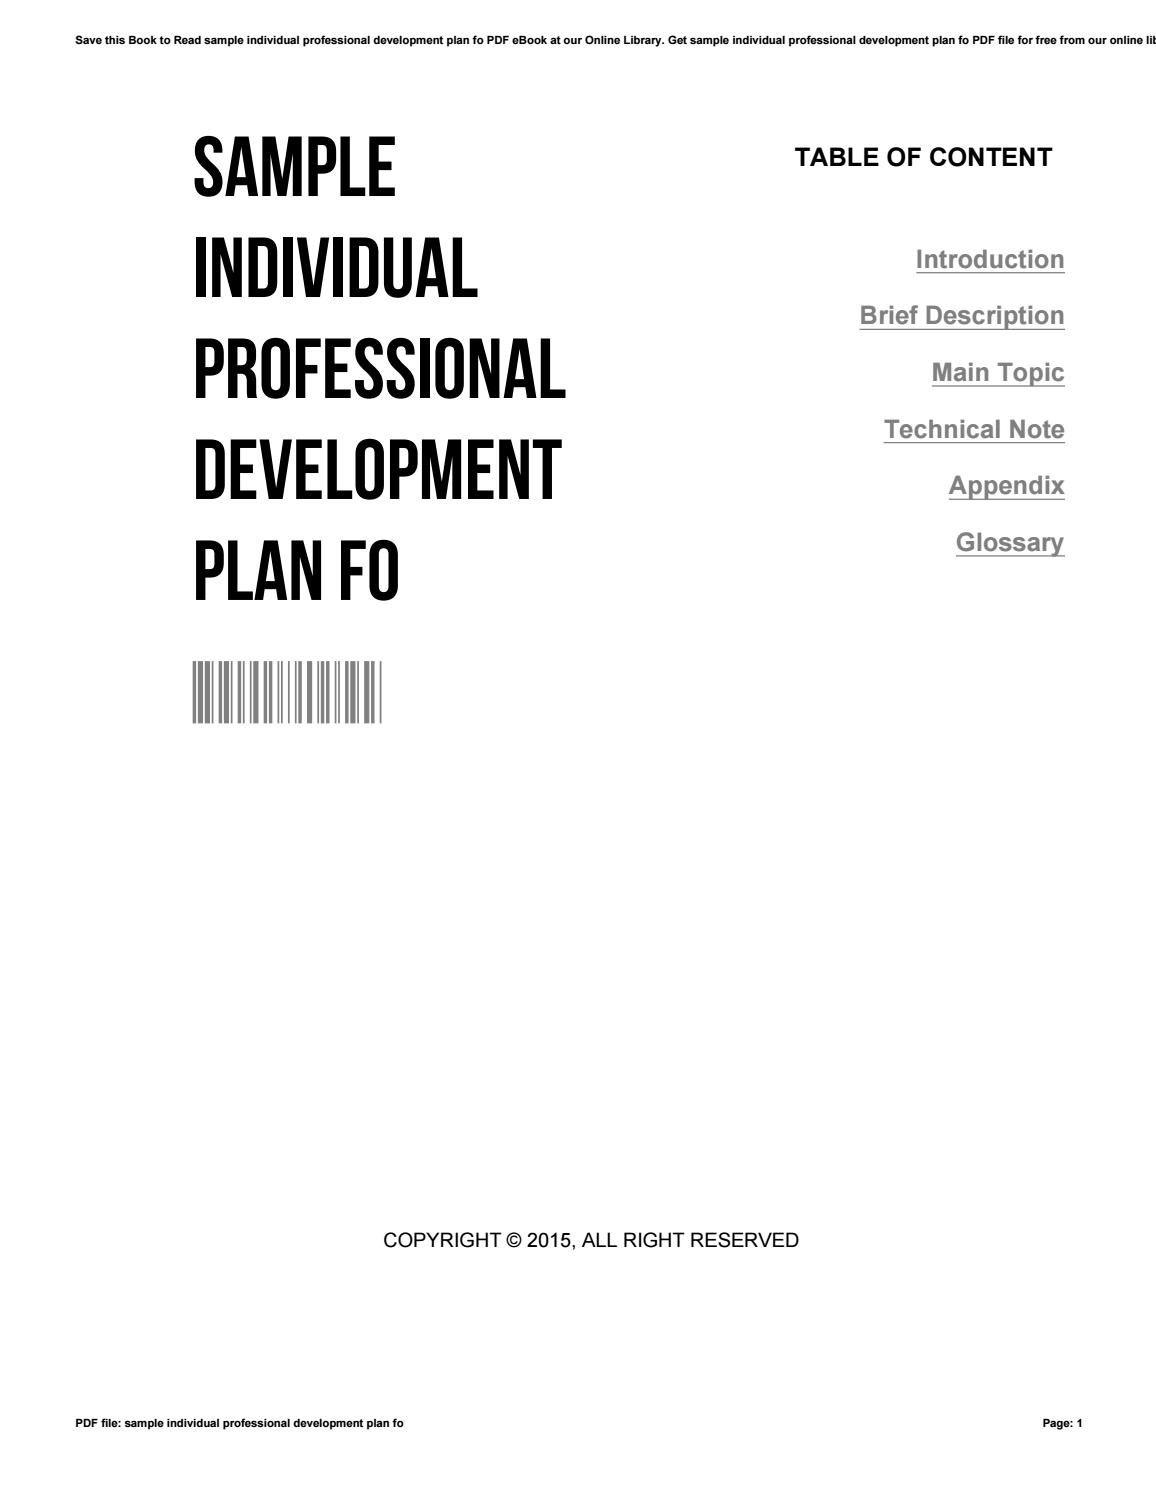 009 Amazing Professional Development Plan Template Pdf Picture  Sample ExampleFull